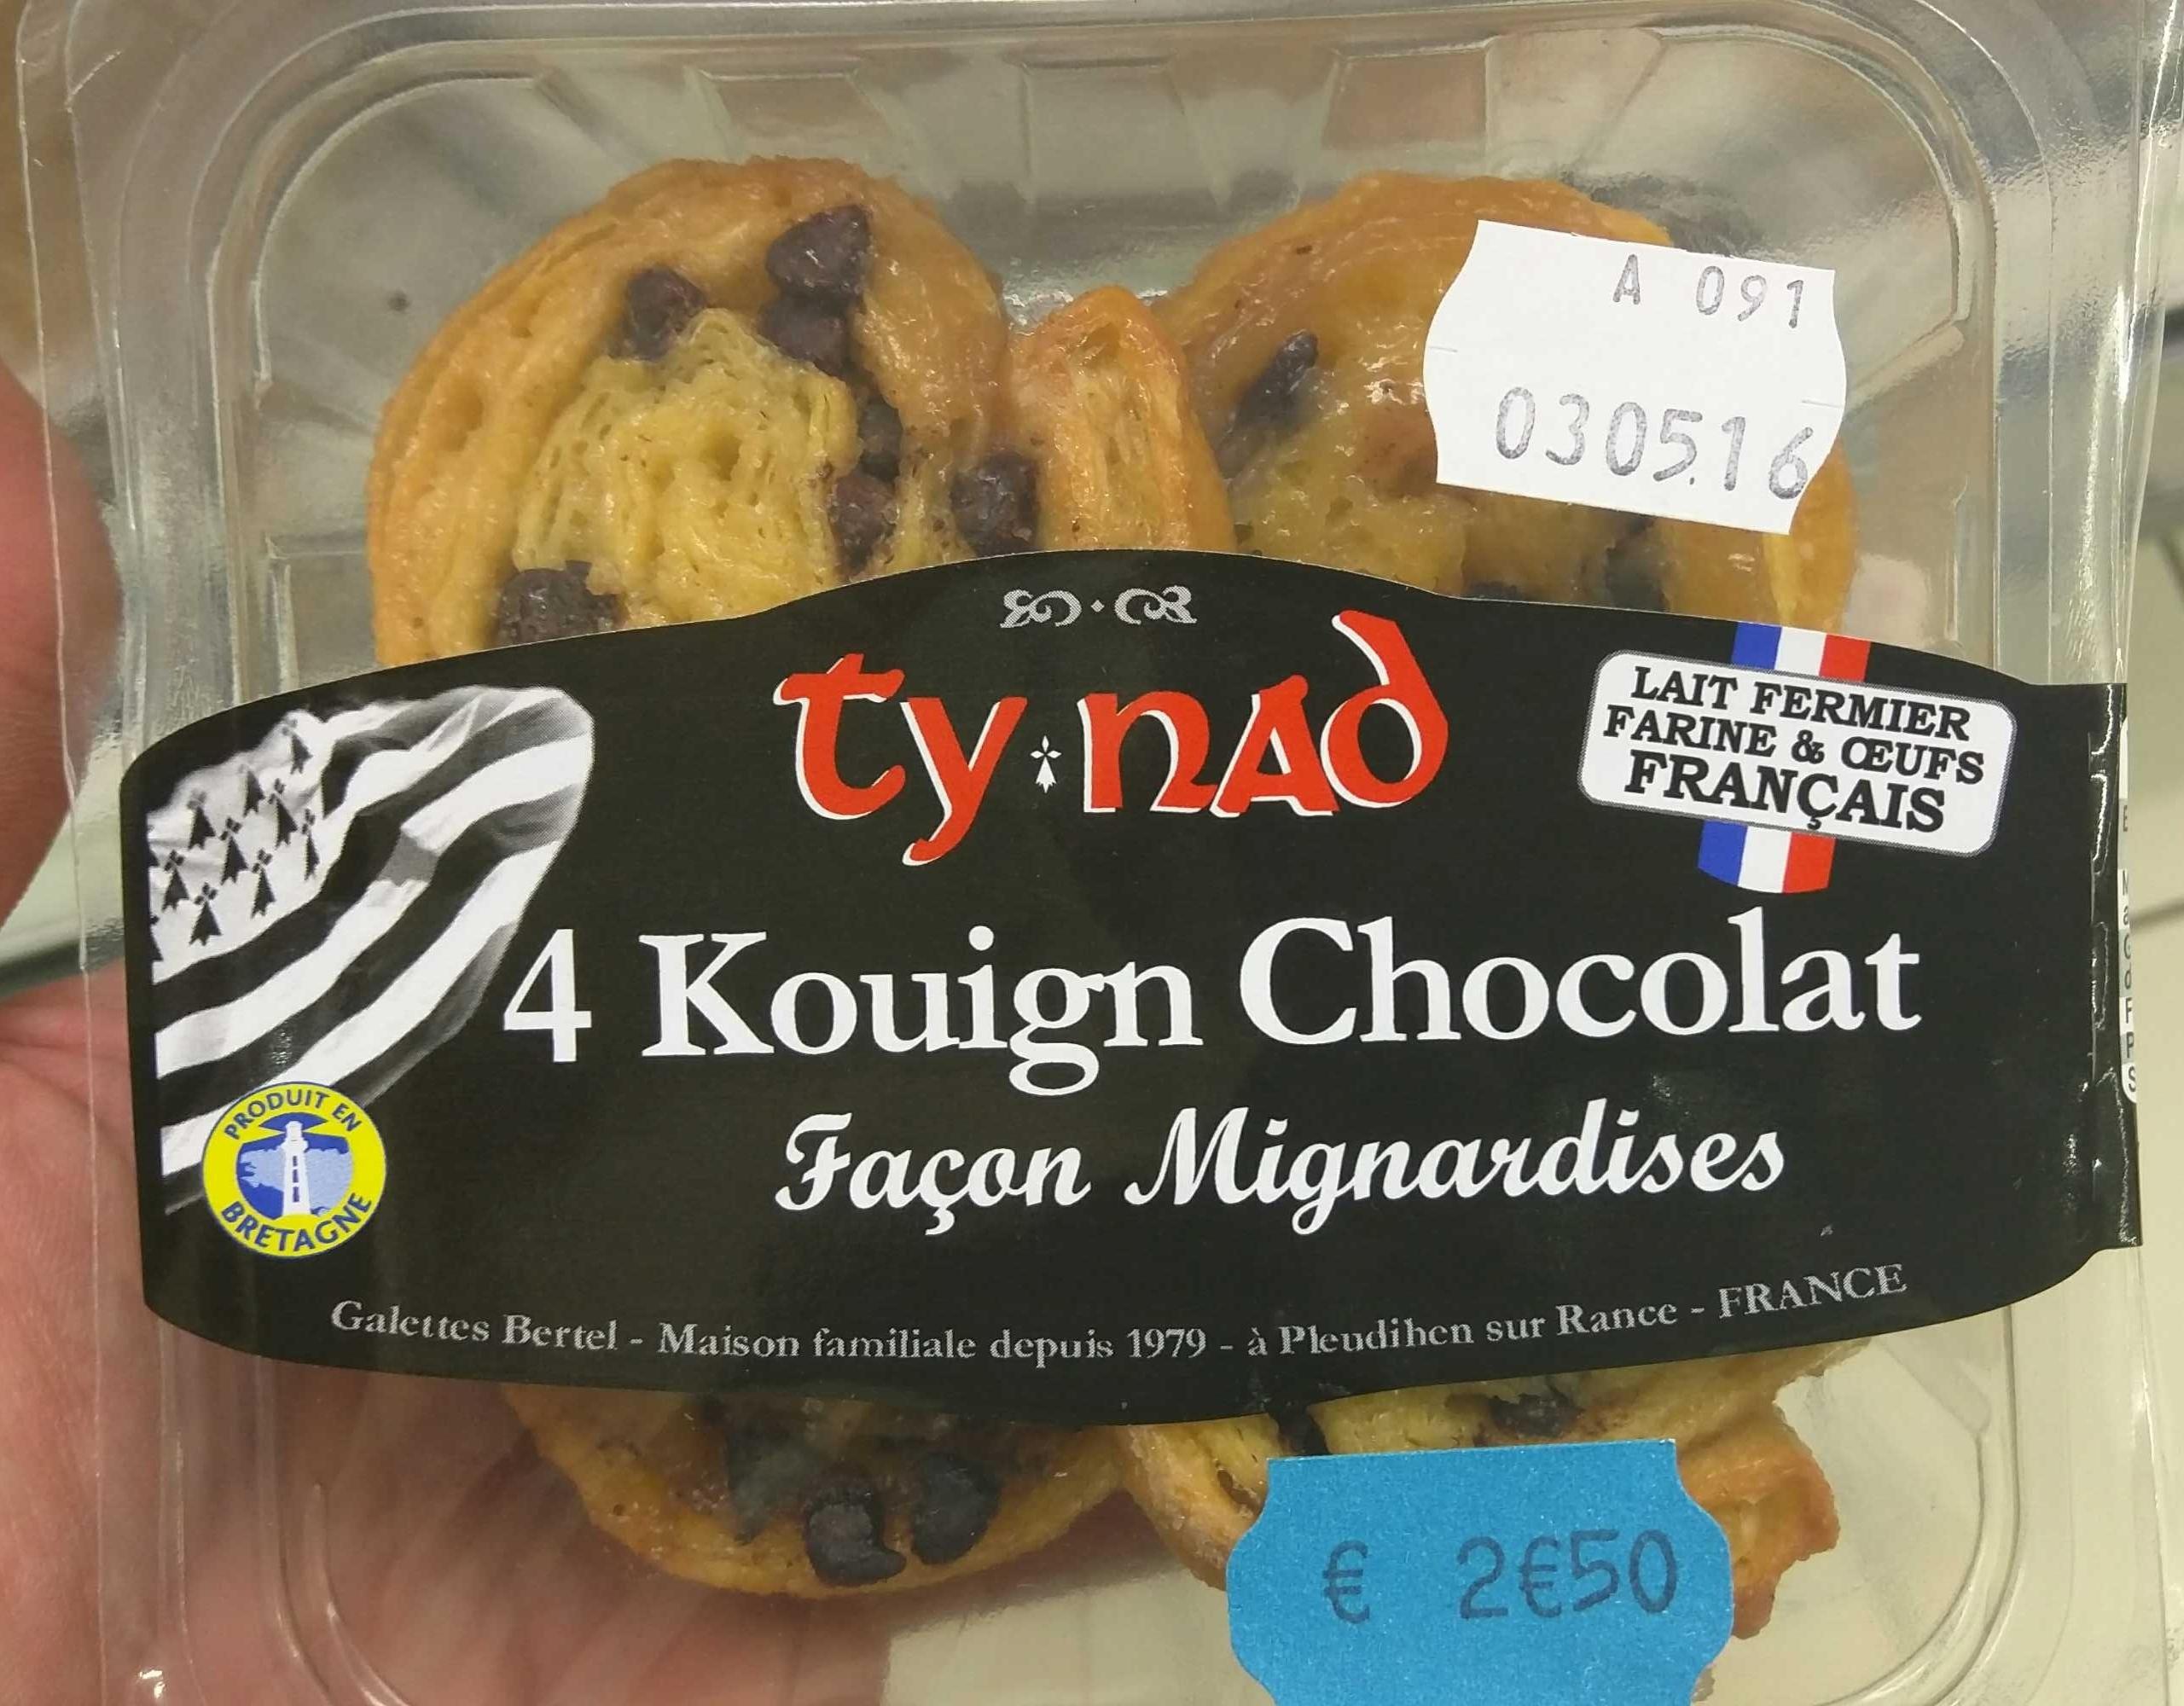 Kouign Chocolat Façon Mignardises - Product - fr